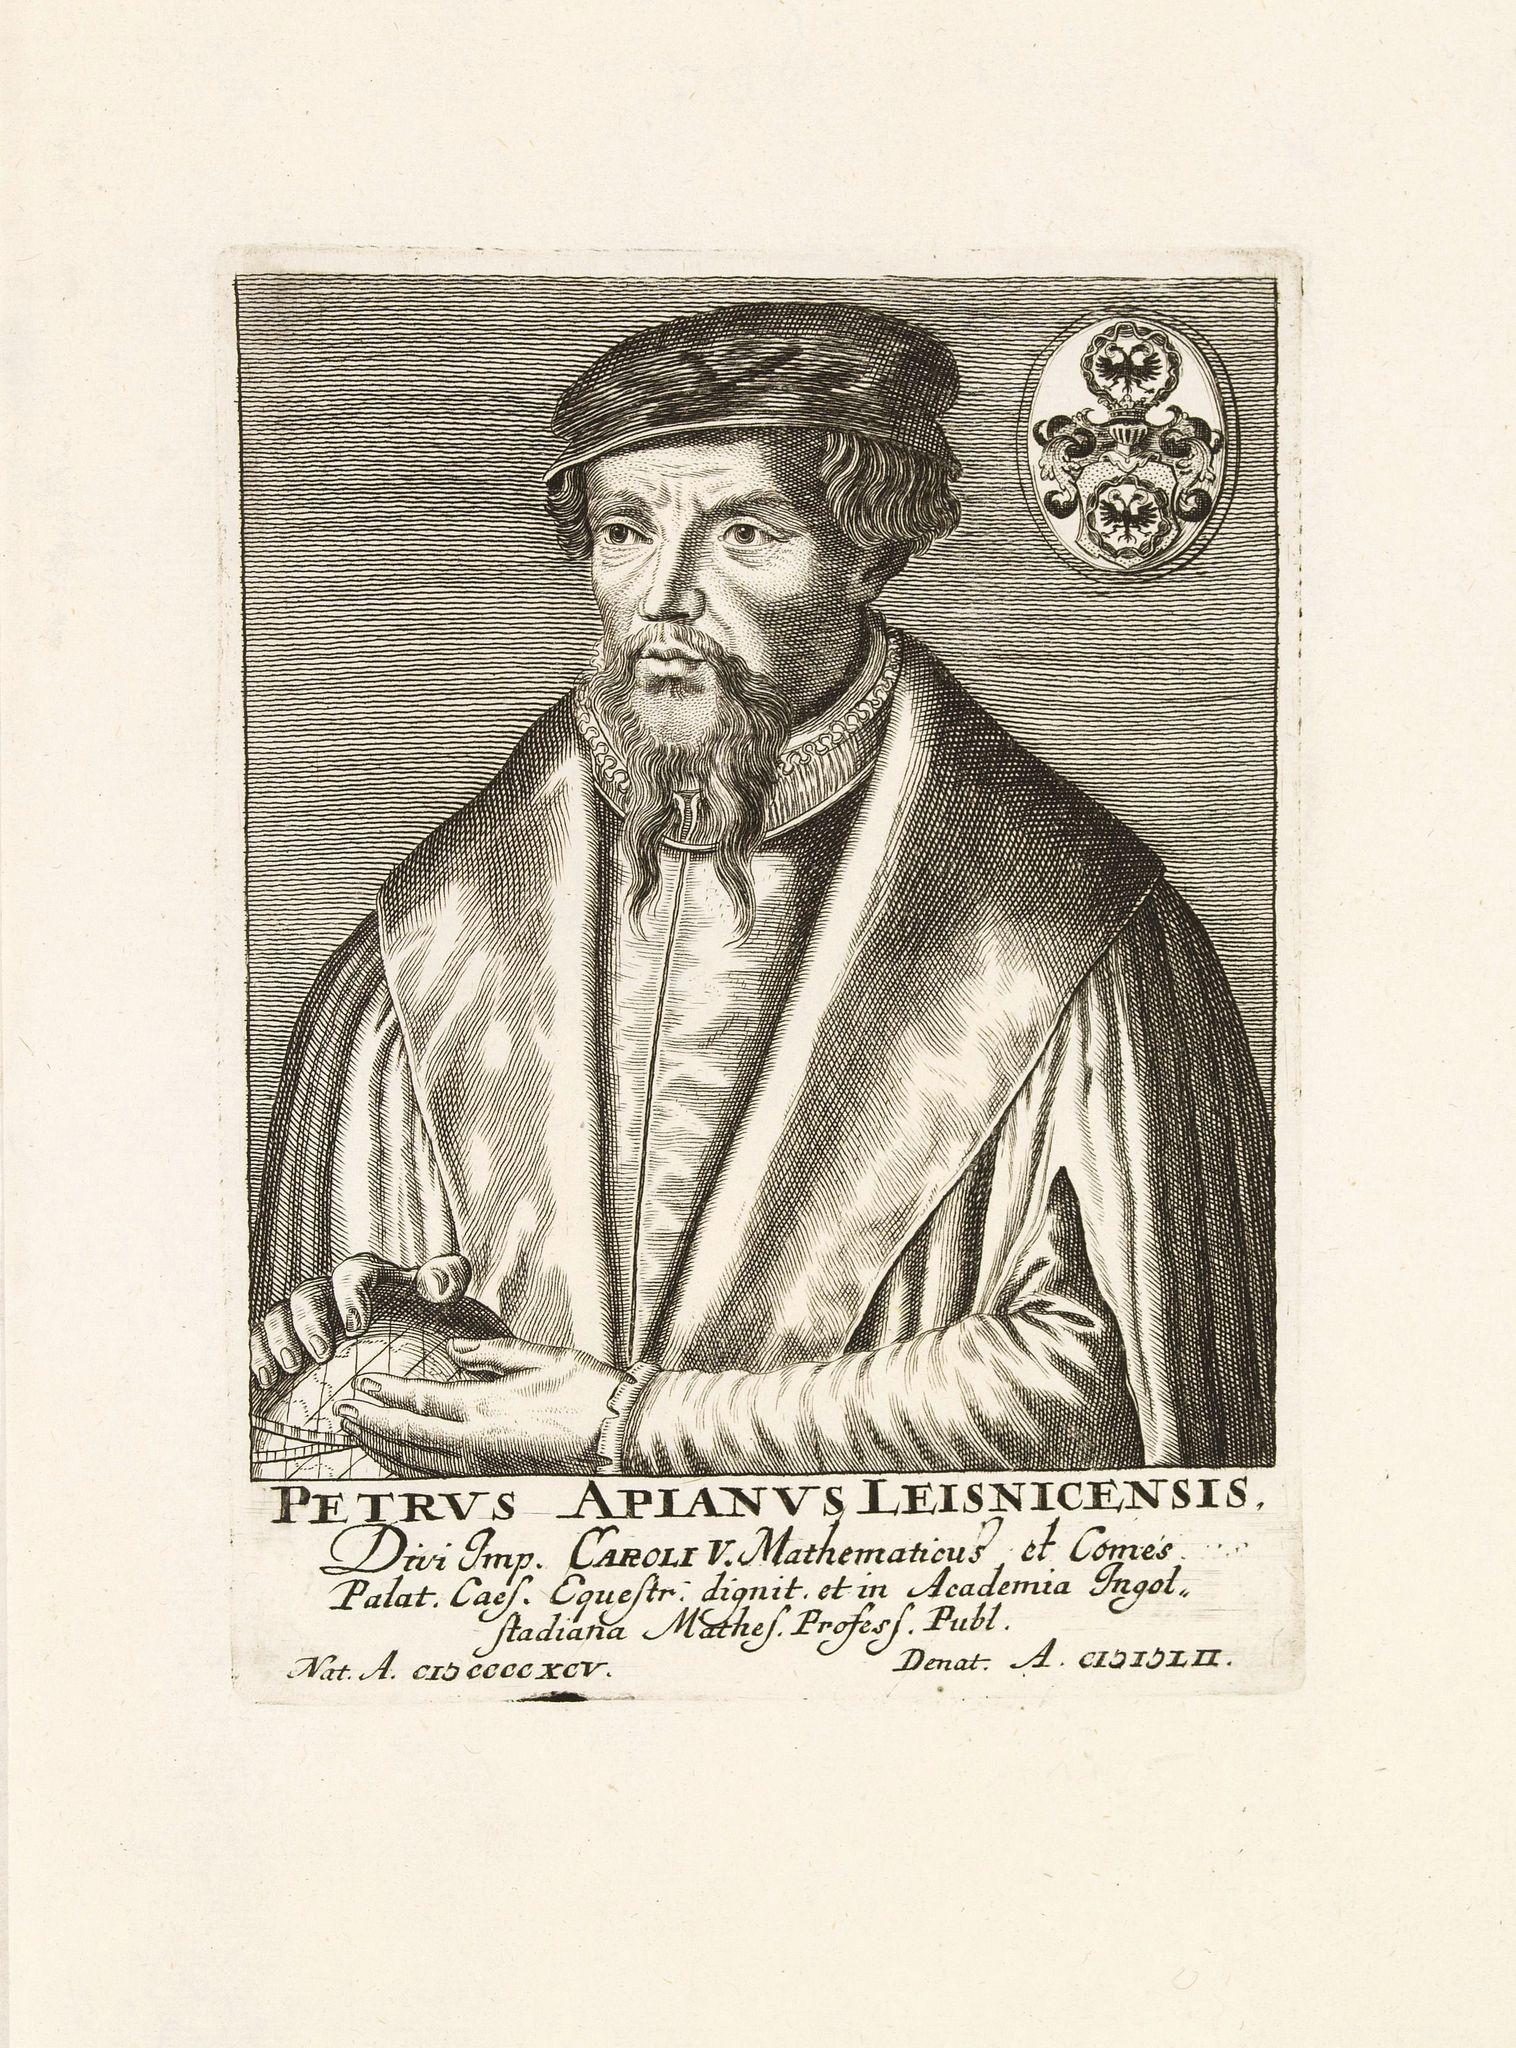 KILIAN, W. -  Petrus Apianus Leisnicensis.